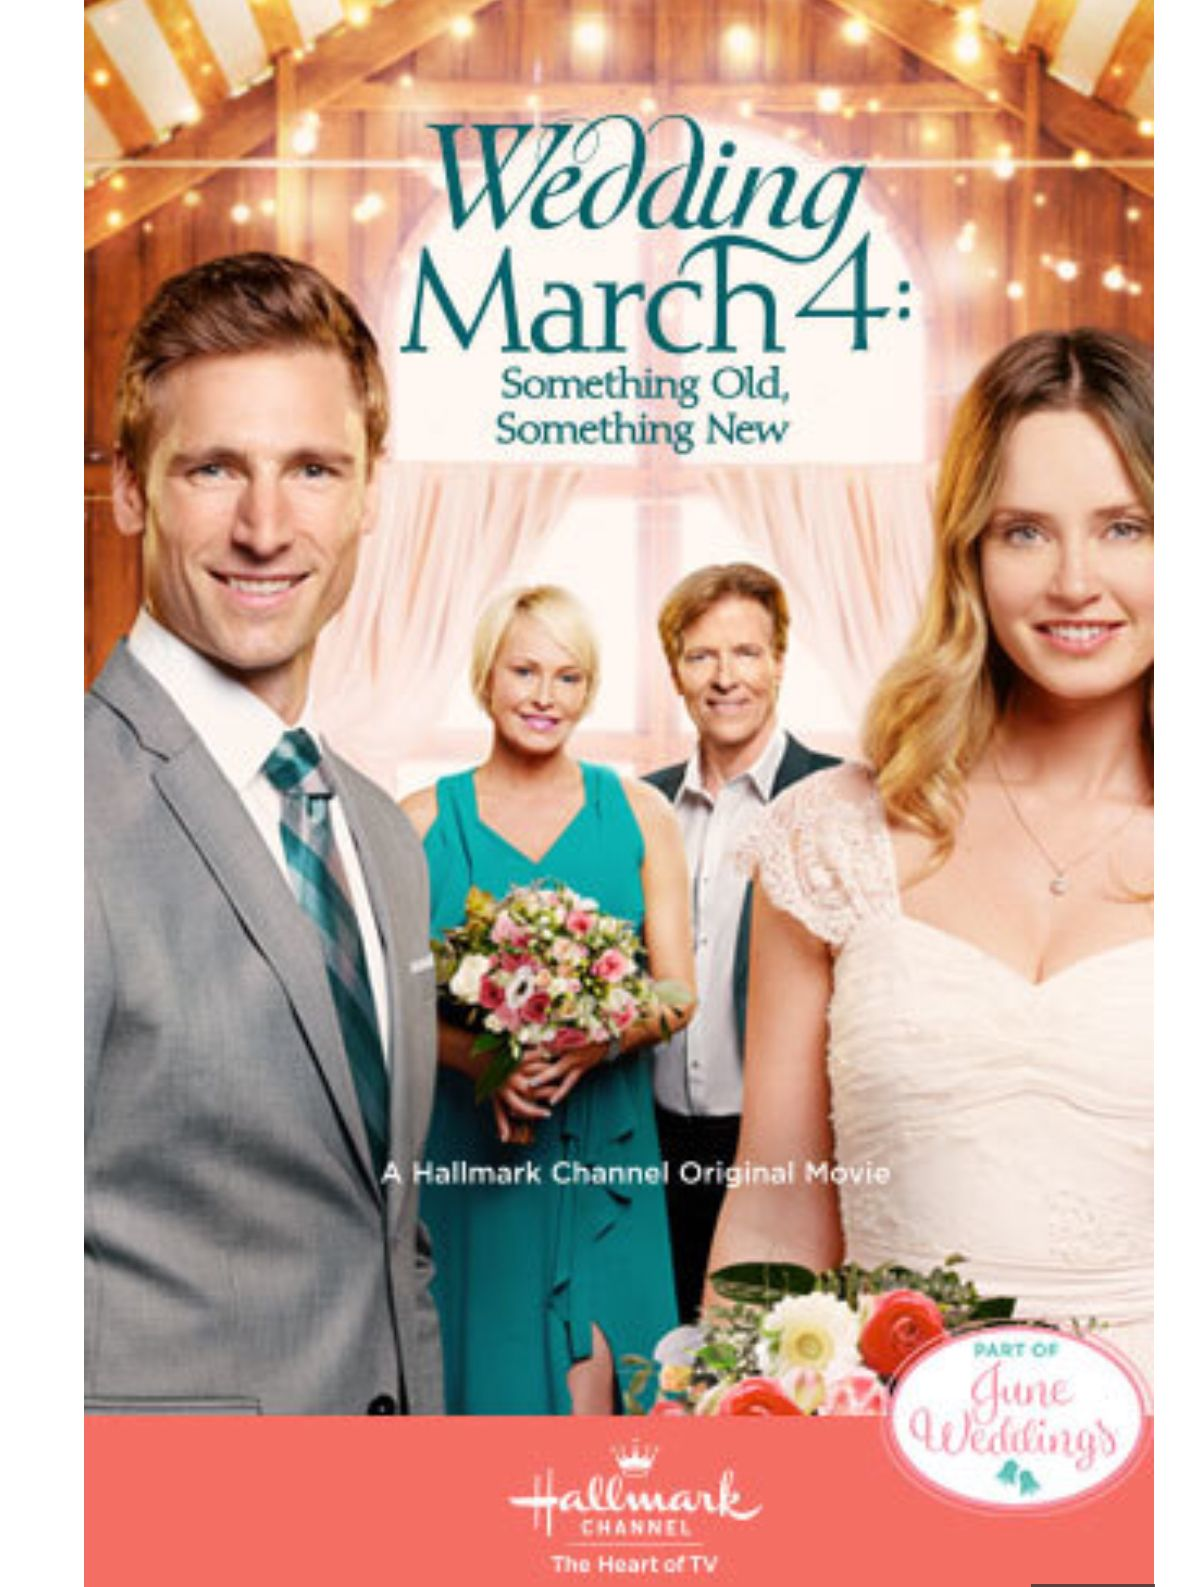 Pin by Cheryl Jetter on Hallmark Movies Wedding movies